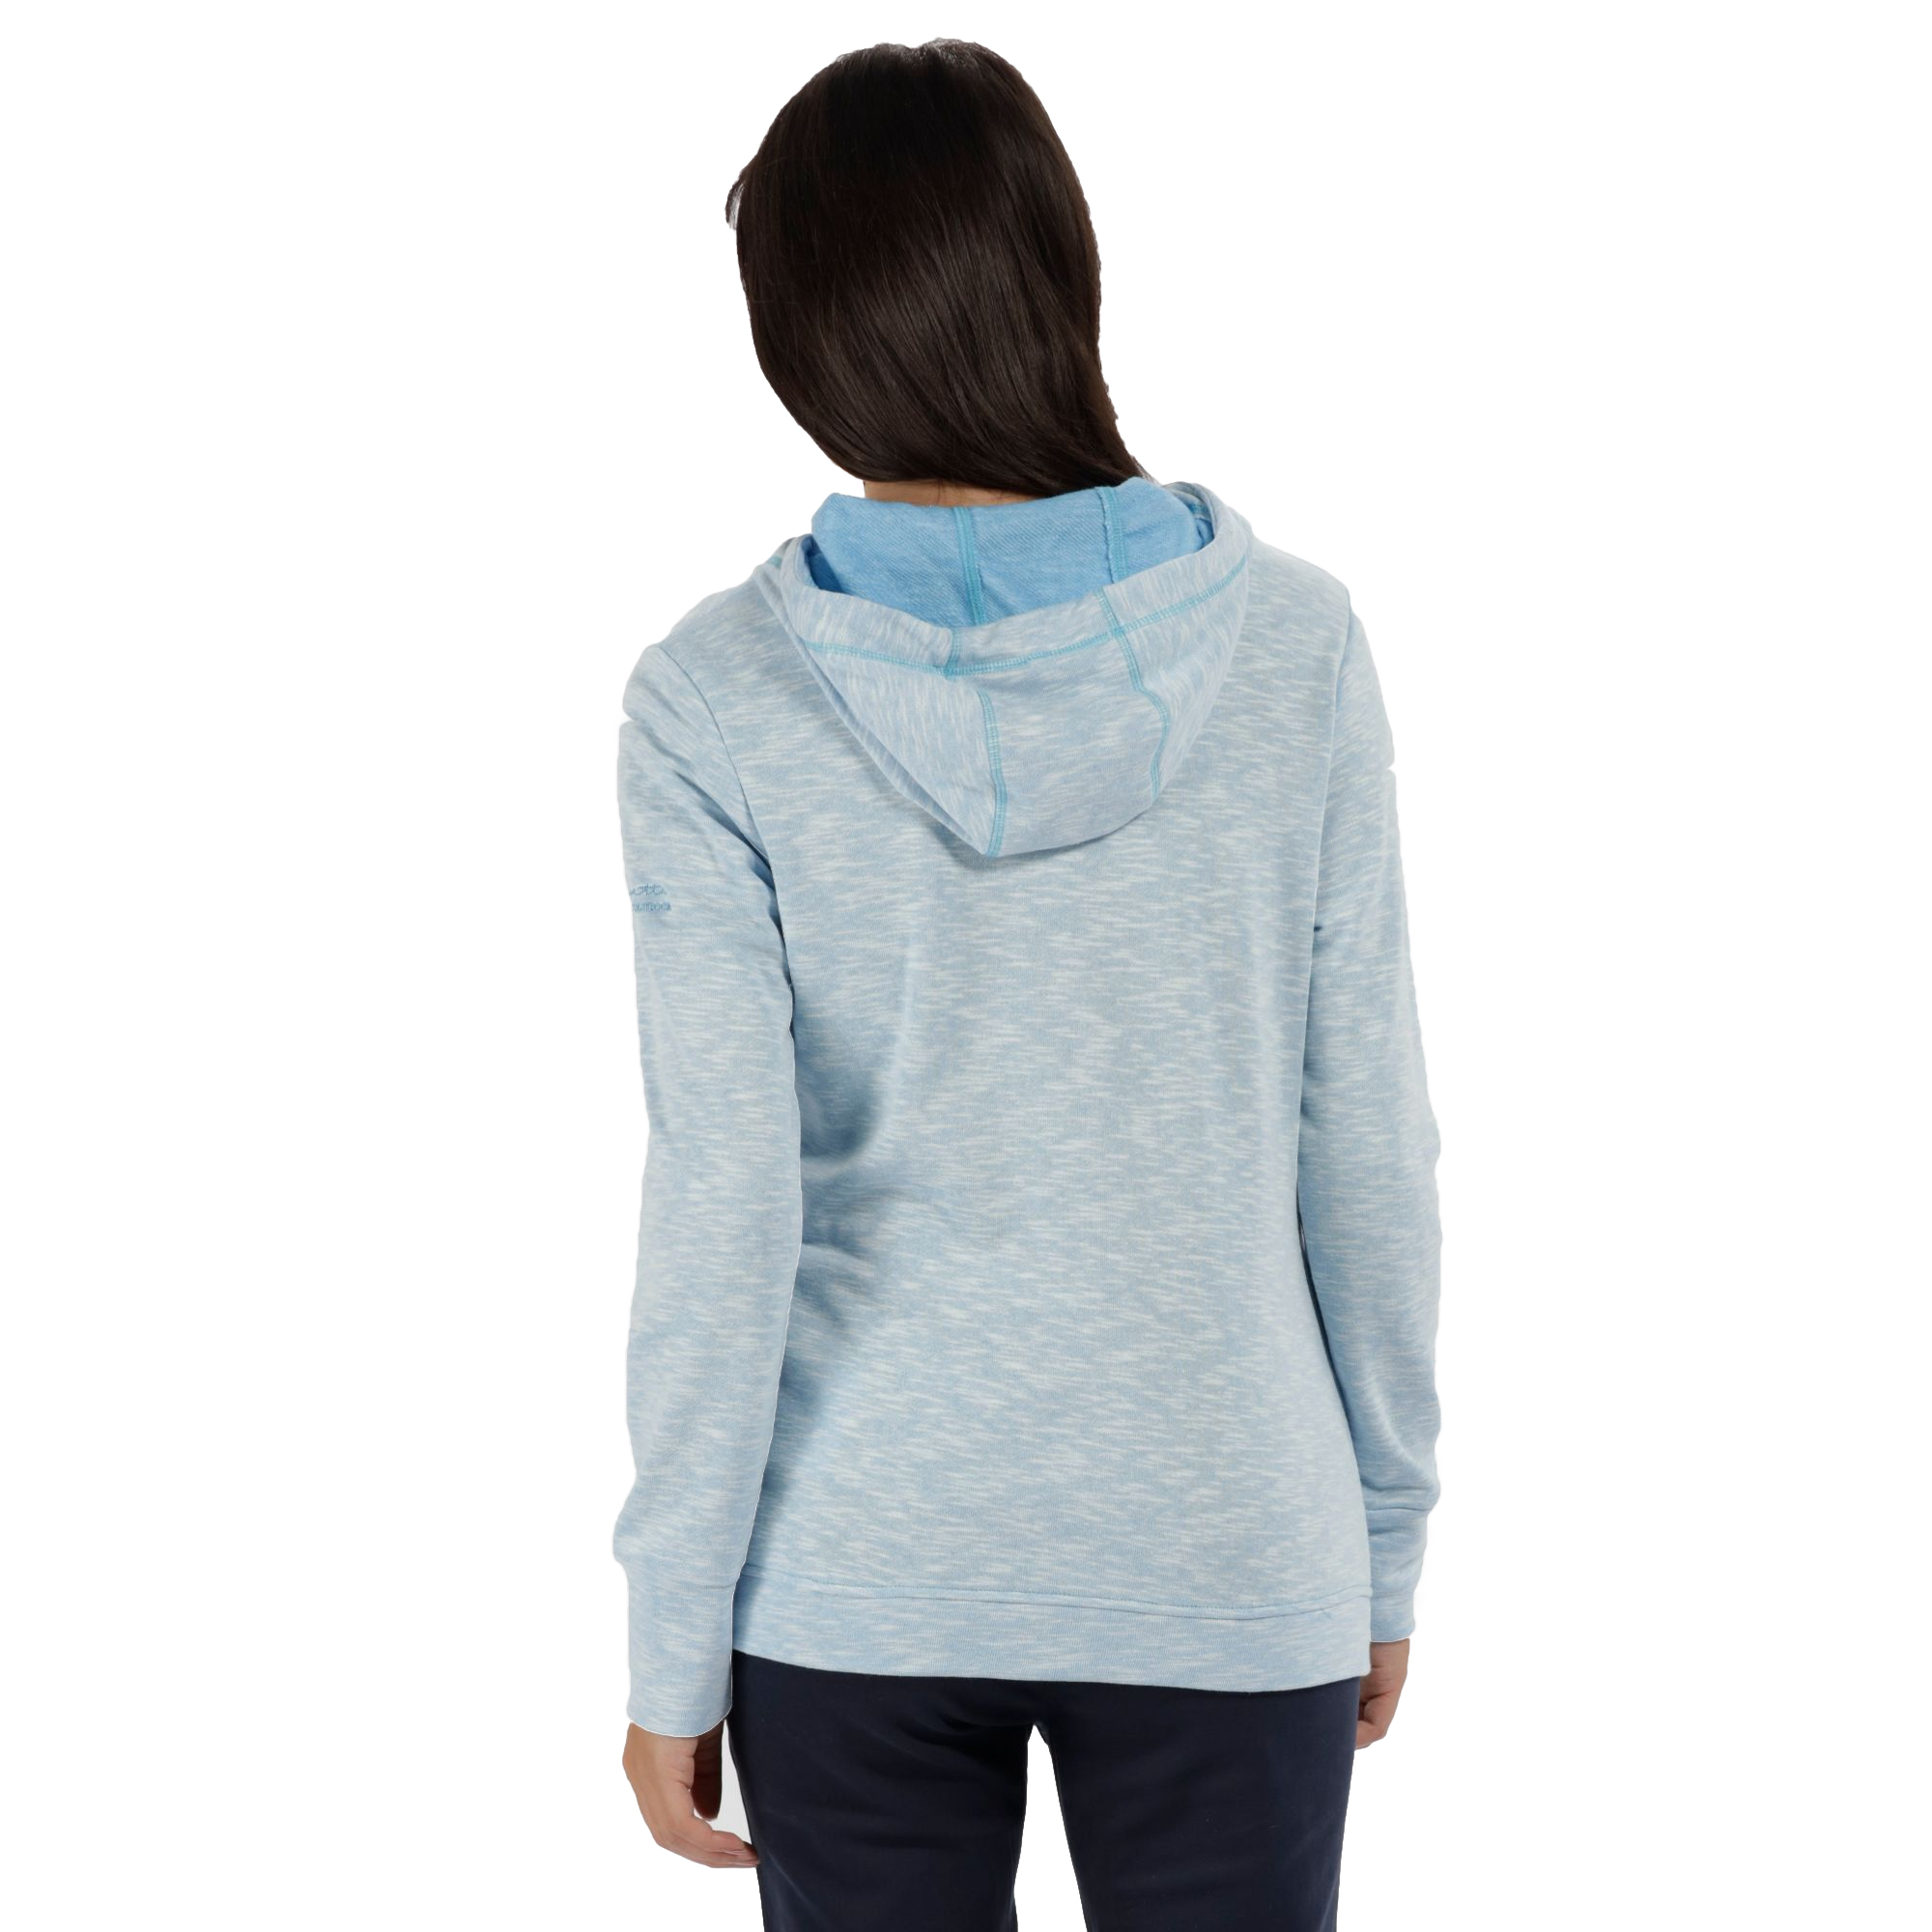 Regatta-Ramosa-Womens-Full-Zip-Hoodie-Hooded-Fleece-Jacket-RRP-50 thumbnail 11